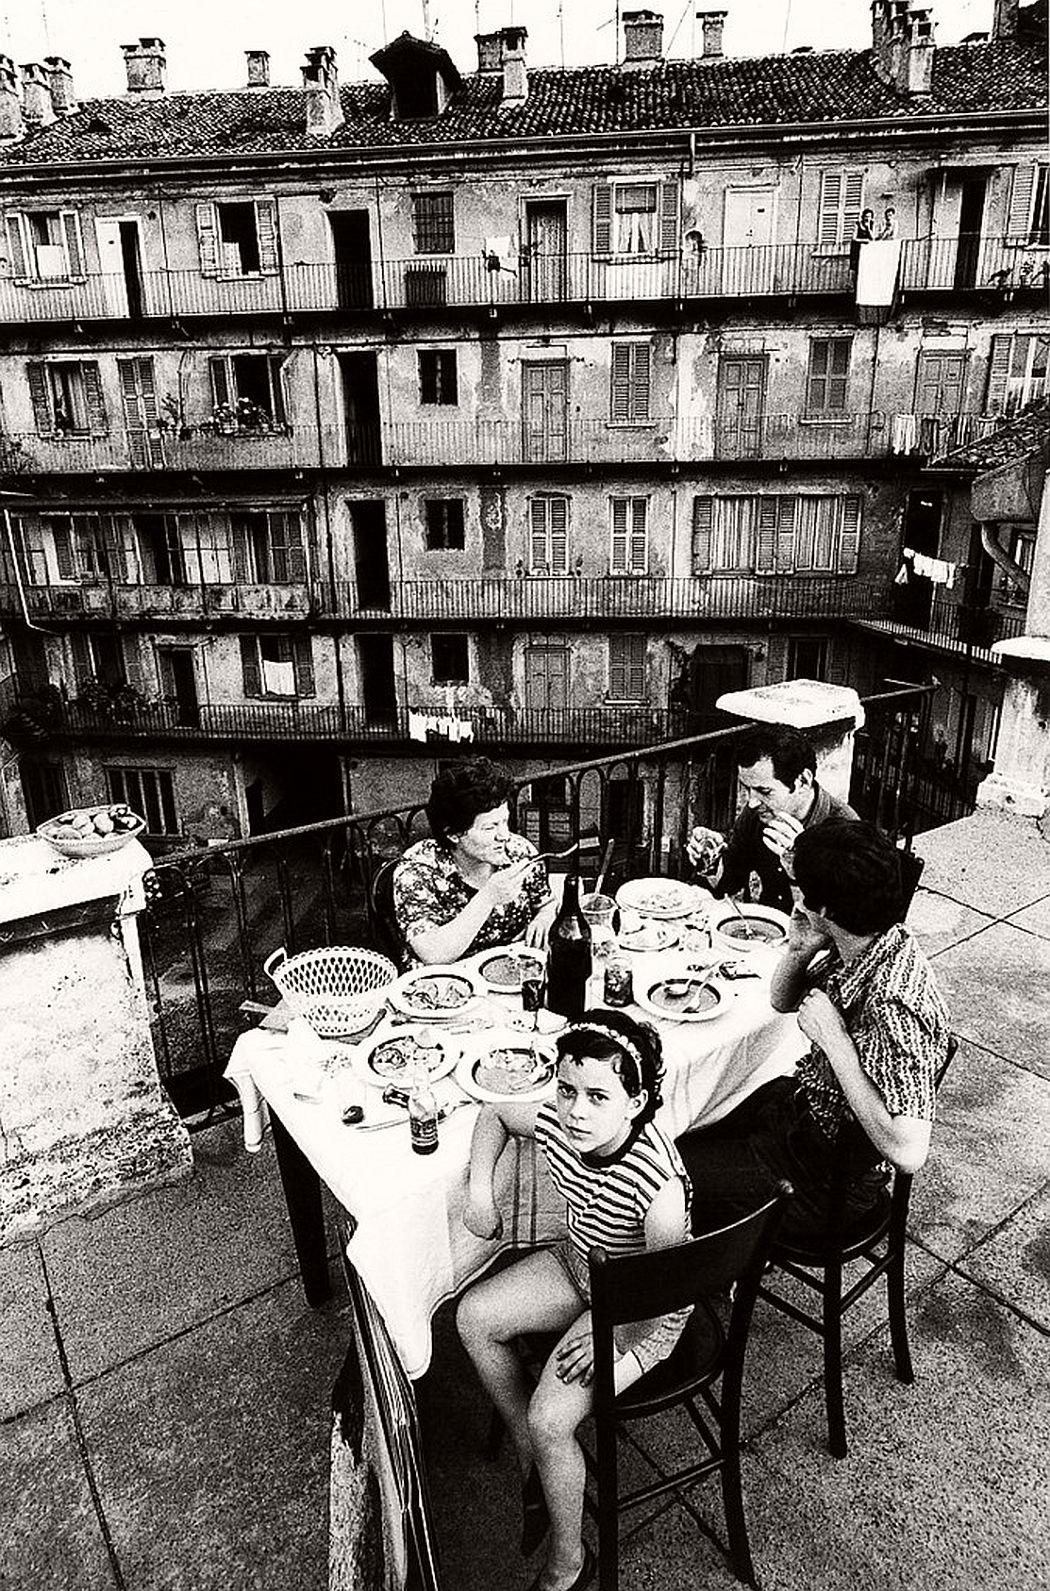 gianni-berengo-gardin-everyday-life-in-italy-1960s-12